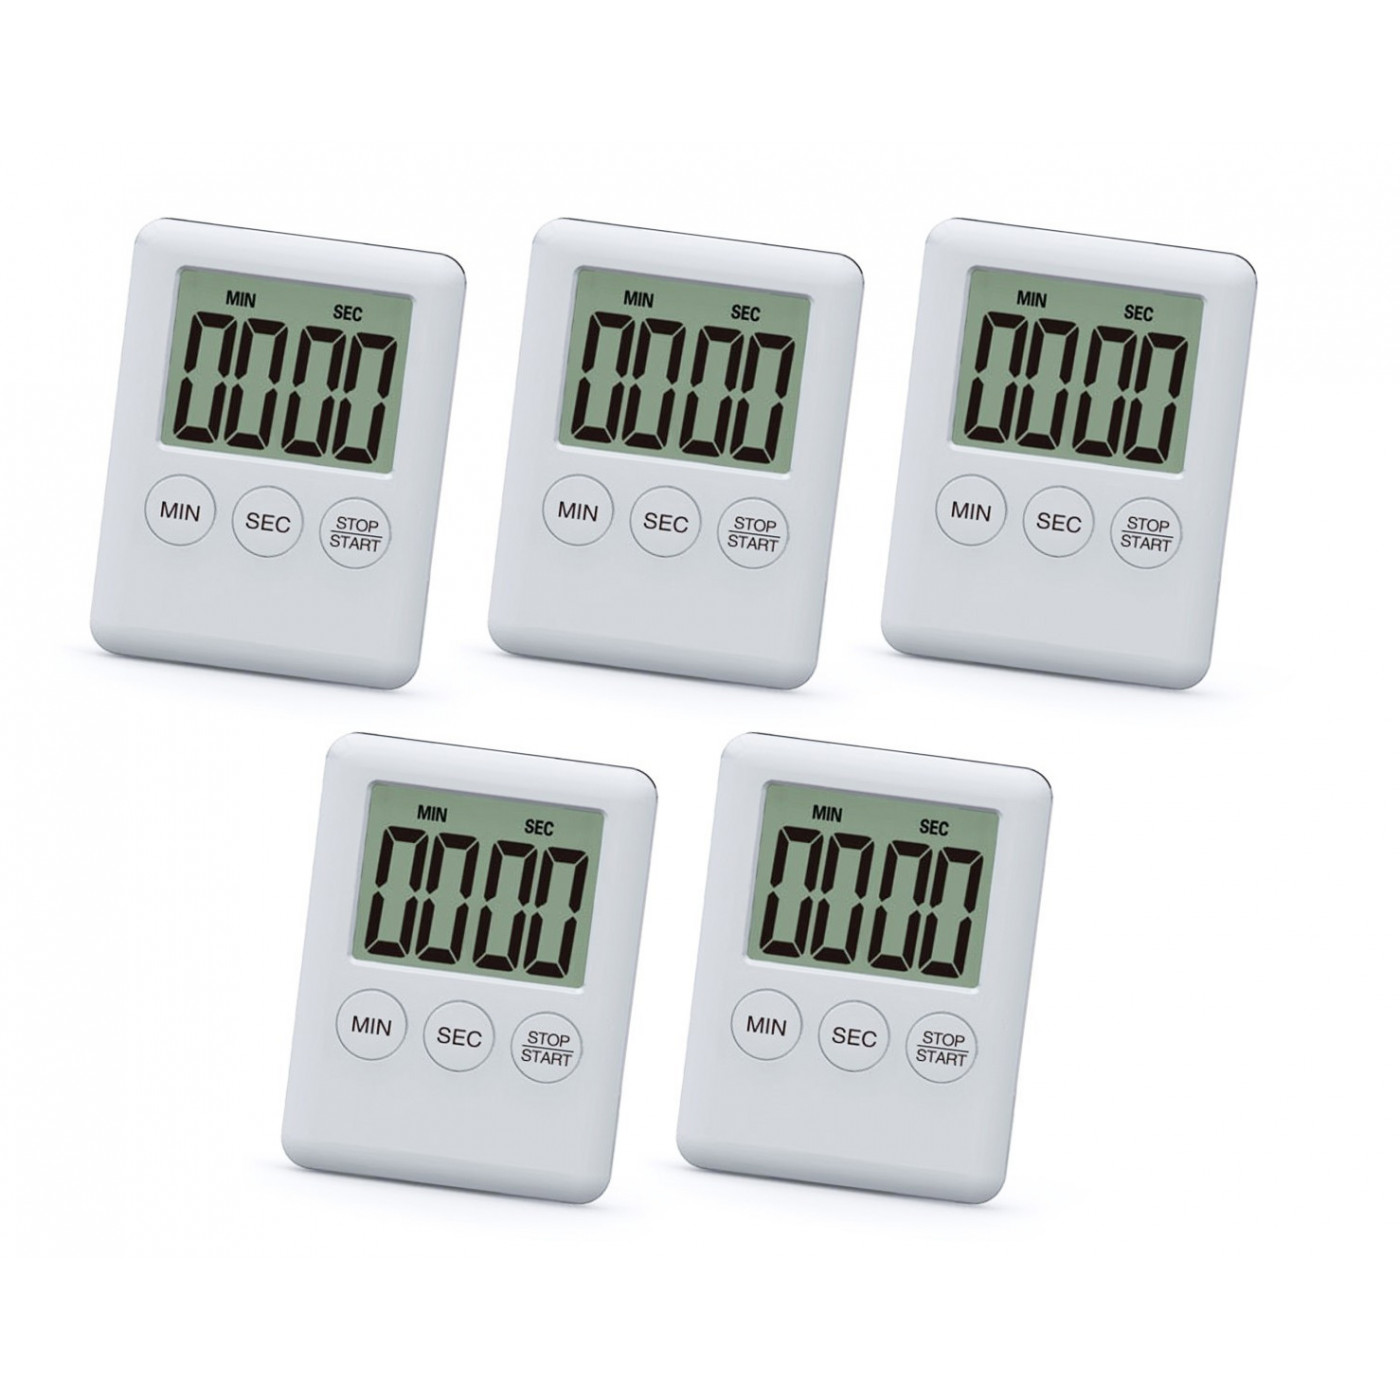 Conjunto de 5 temporizadores digitais, despertadores, brancos  - 1